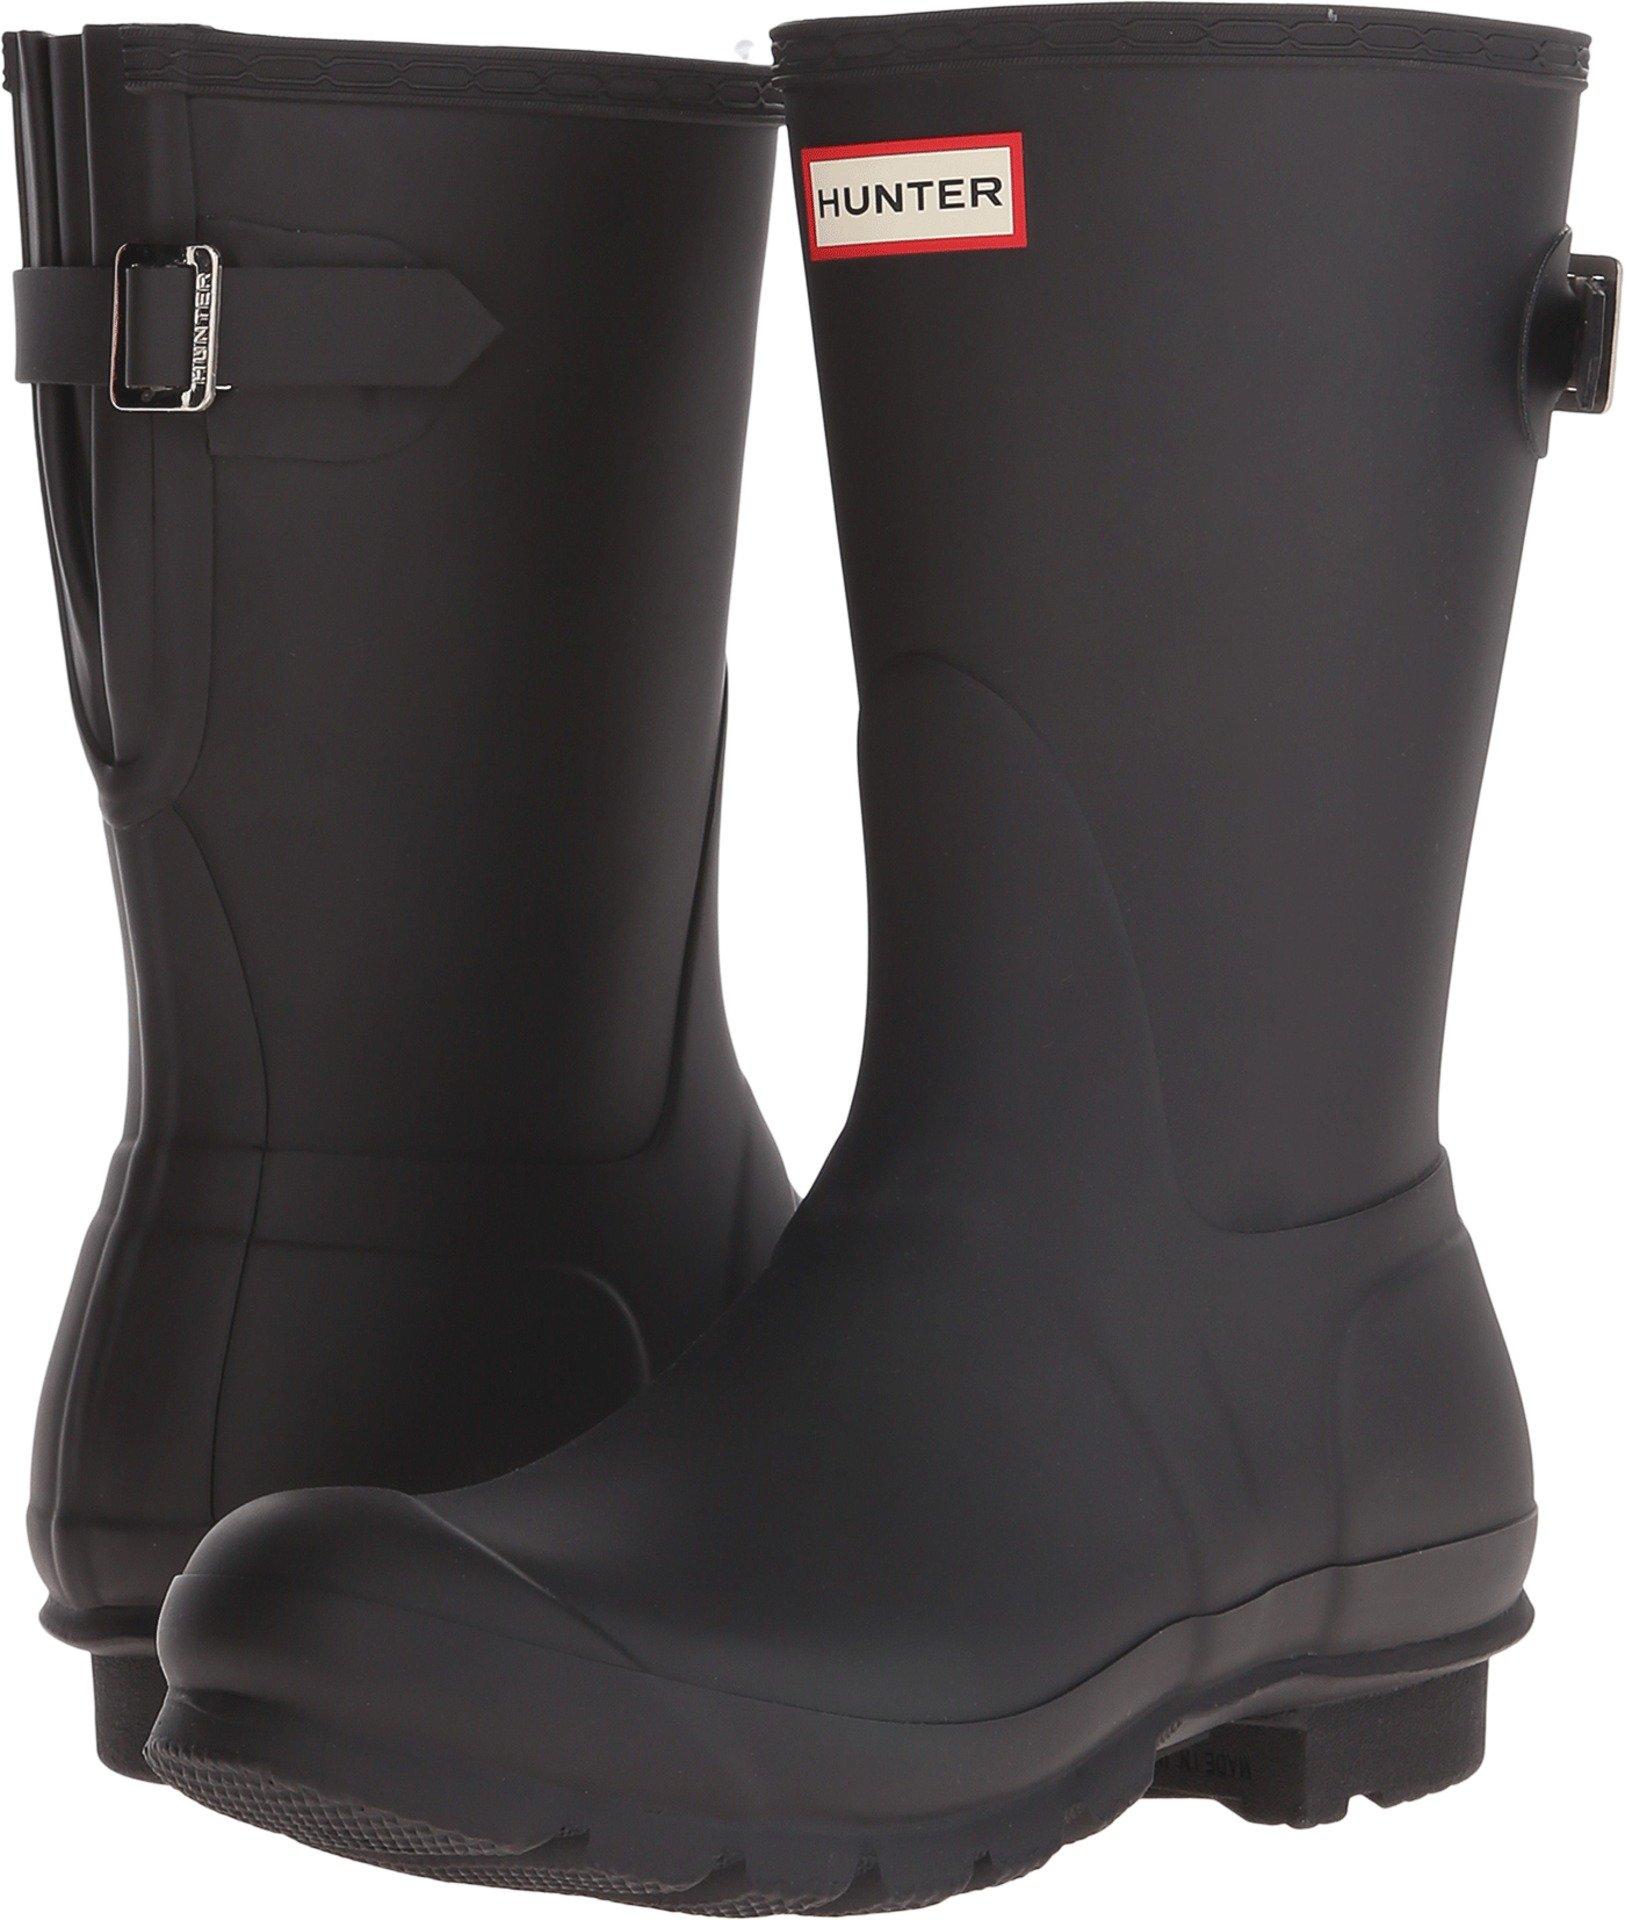 Hunter Women's Original Short Back Adjustable Rain Boot Black 7 B(M) US